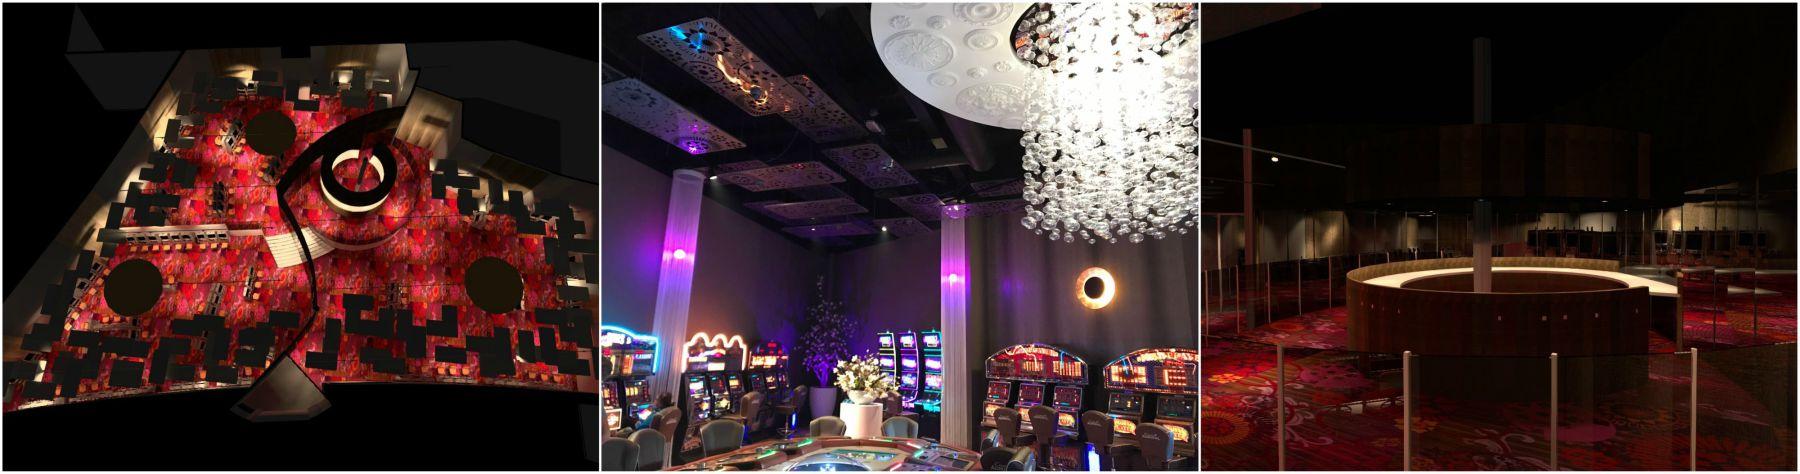 Casino_collage2